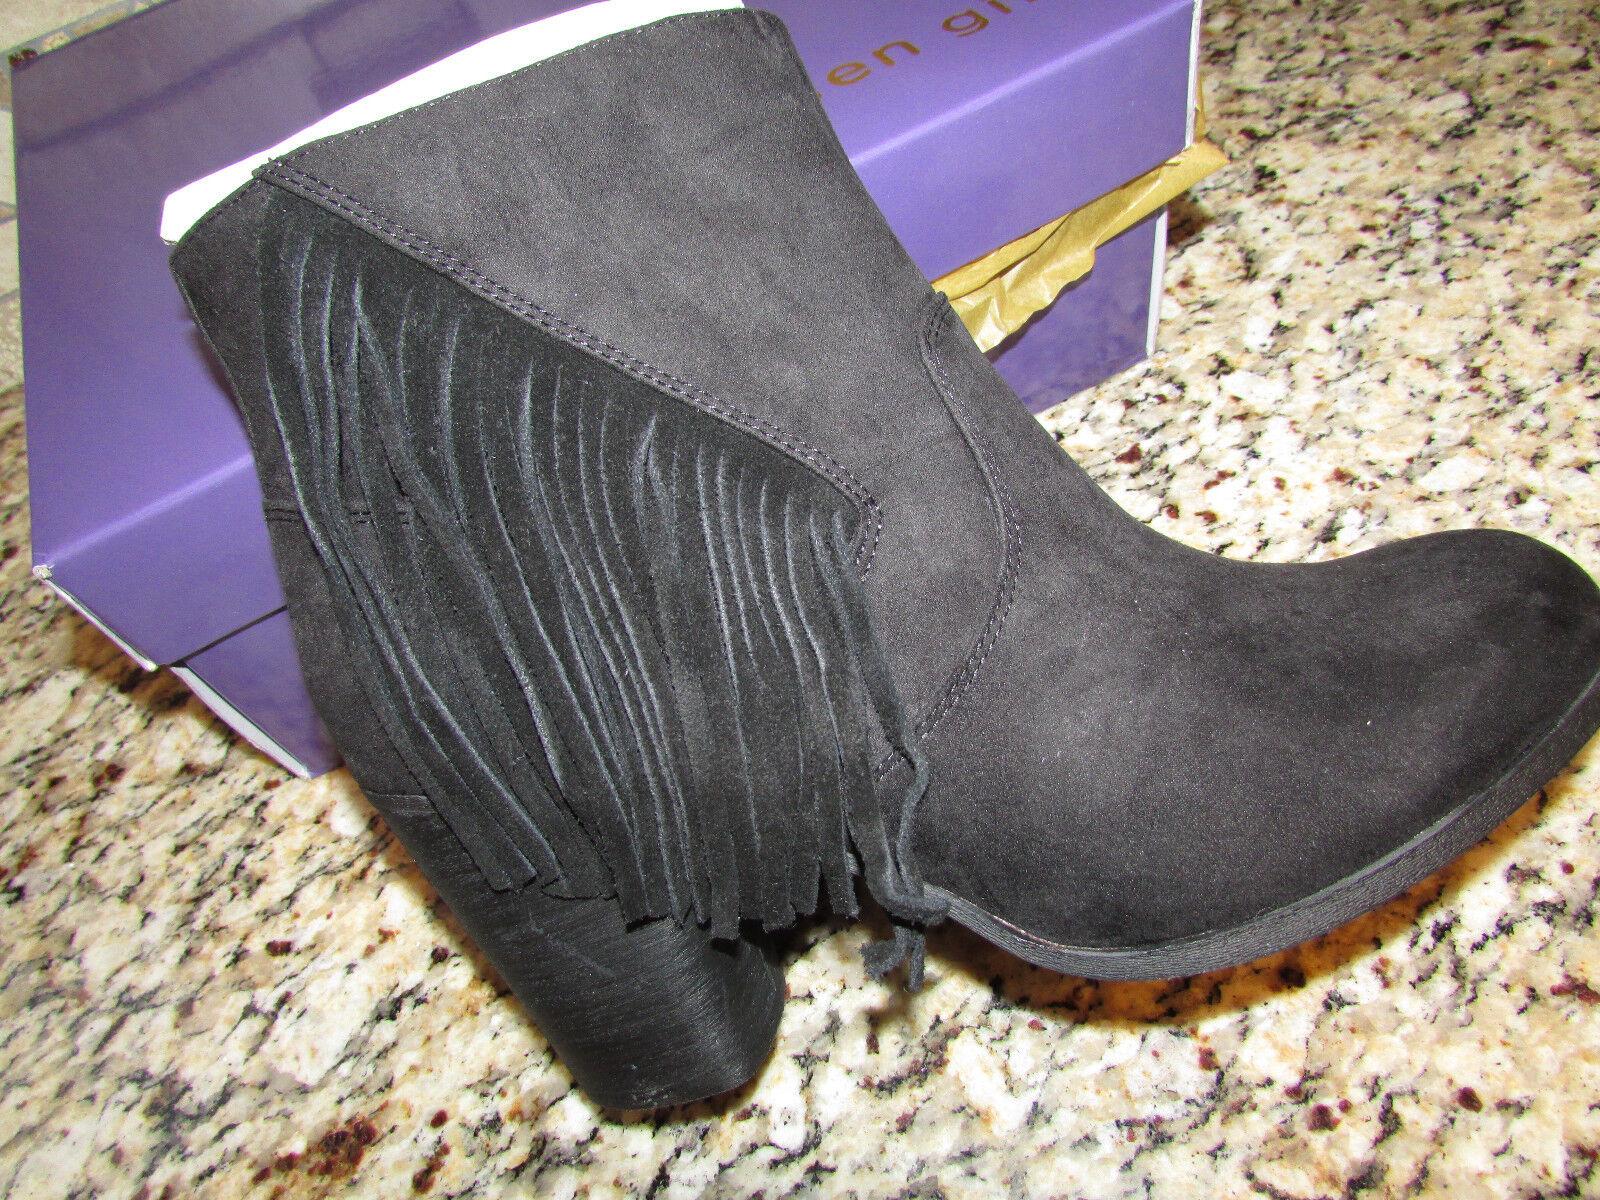 NEU MADDEN GIRL DESCENT BLACK ANKLE BOOTES BOOTS Damenschuhe 8.5 W/ FRINGE FREE SHIP